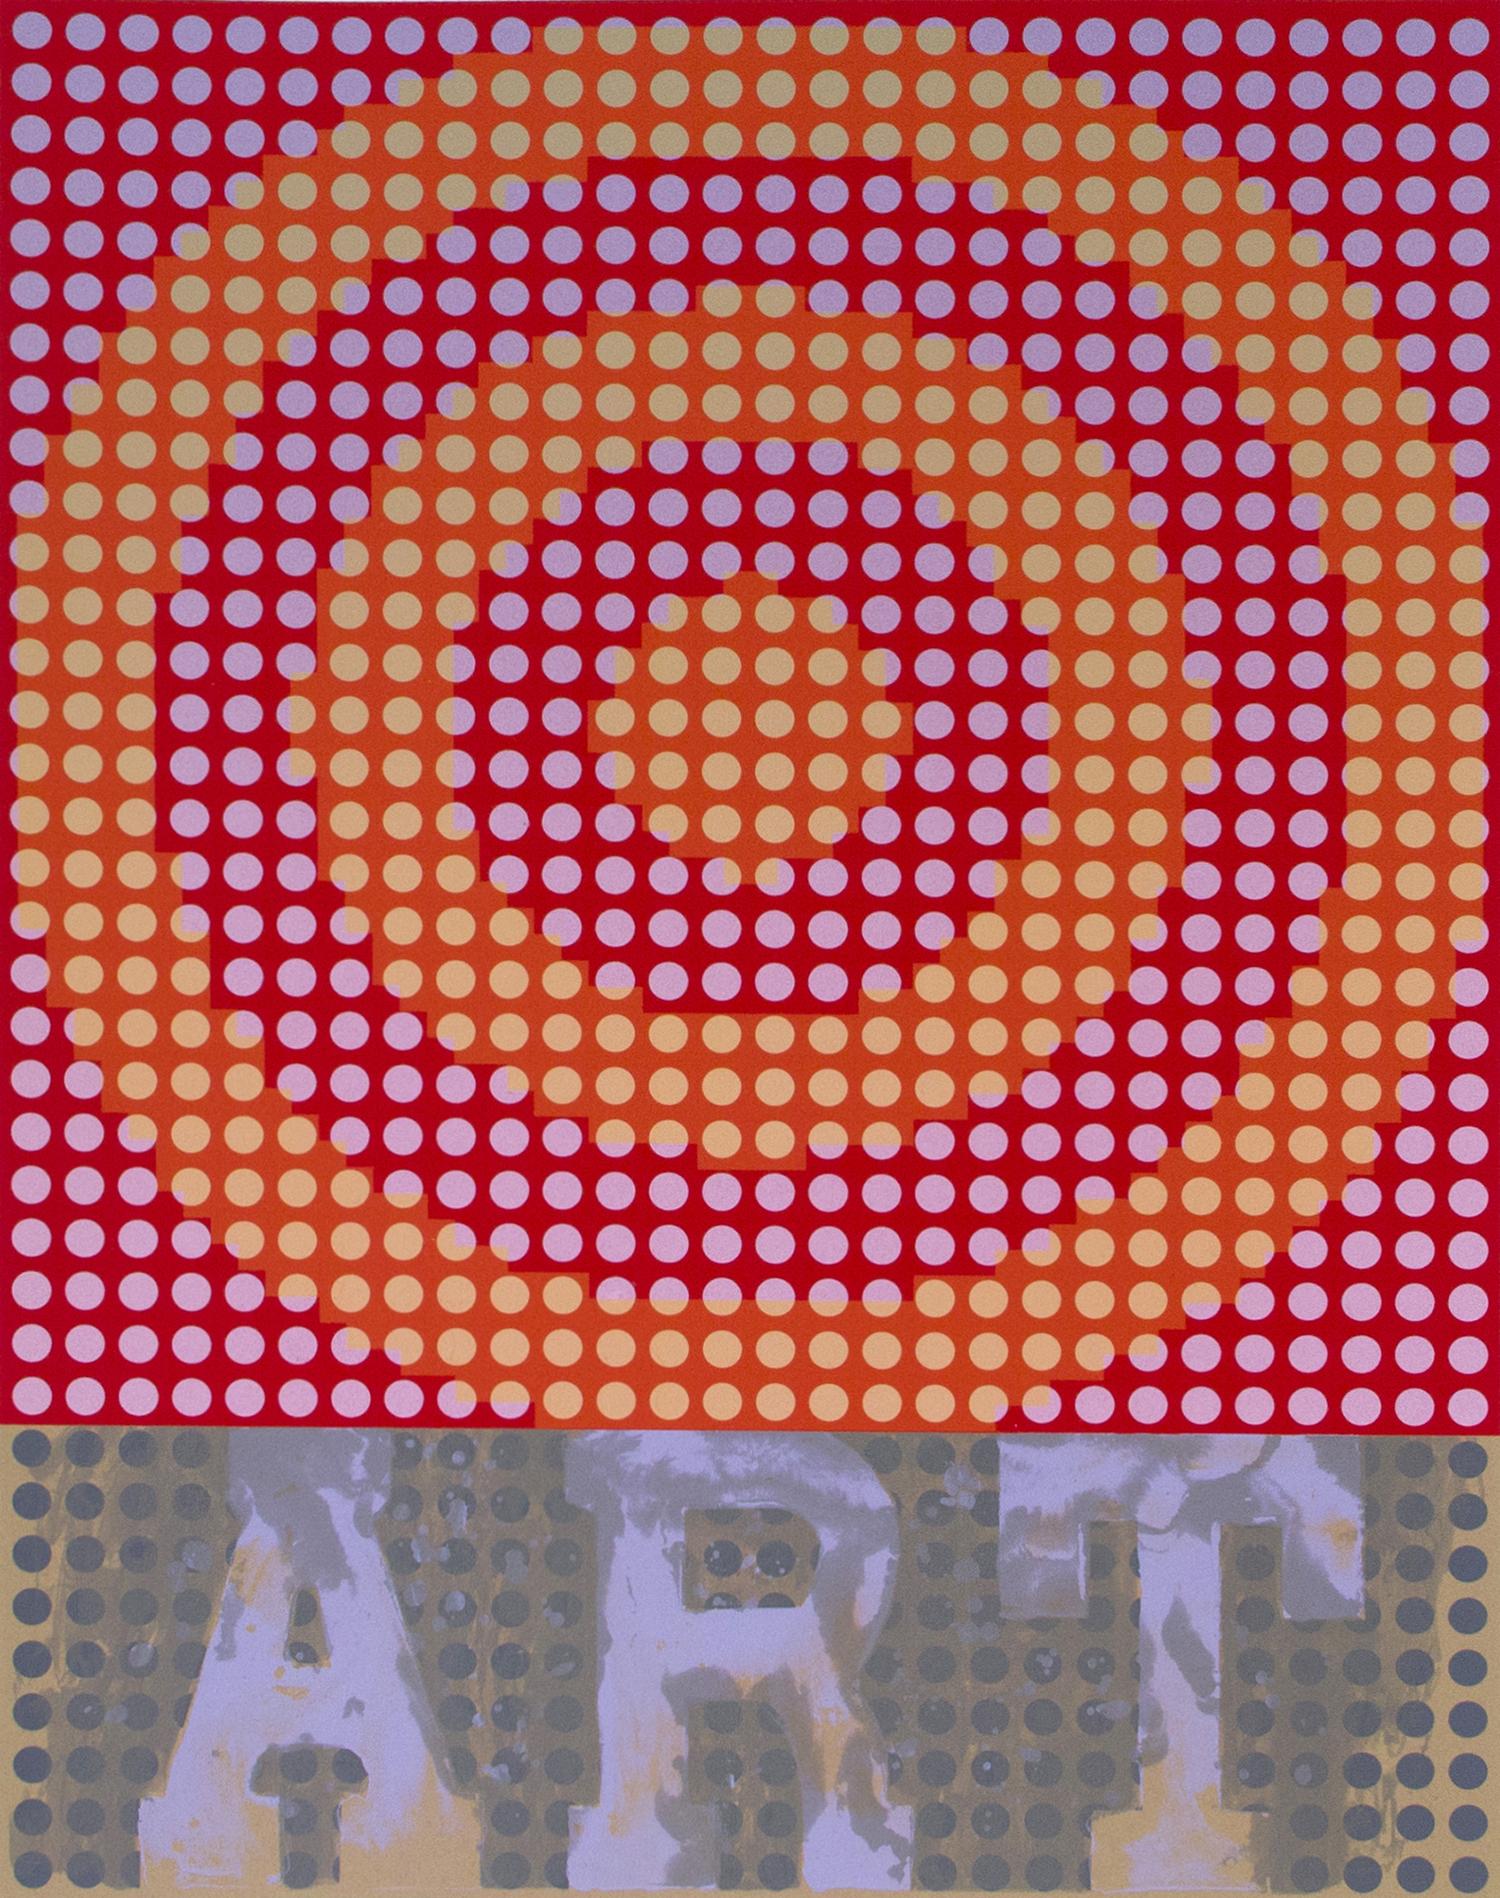 Kip Gresham, The End of Art    Date:  2011   Size (cm - unframed):  84 x 66   Technique:  Screenprint   Materials:  Somerset Velvet 300gsm   Edition size:  15   Publisher:  The Print Studio   Copyright:  The Artist    P.O.A.